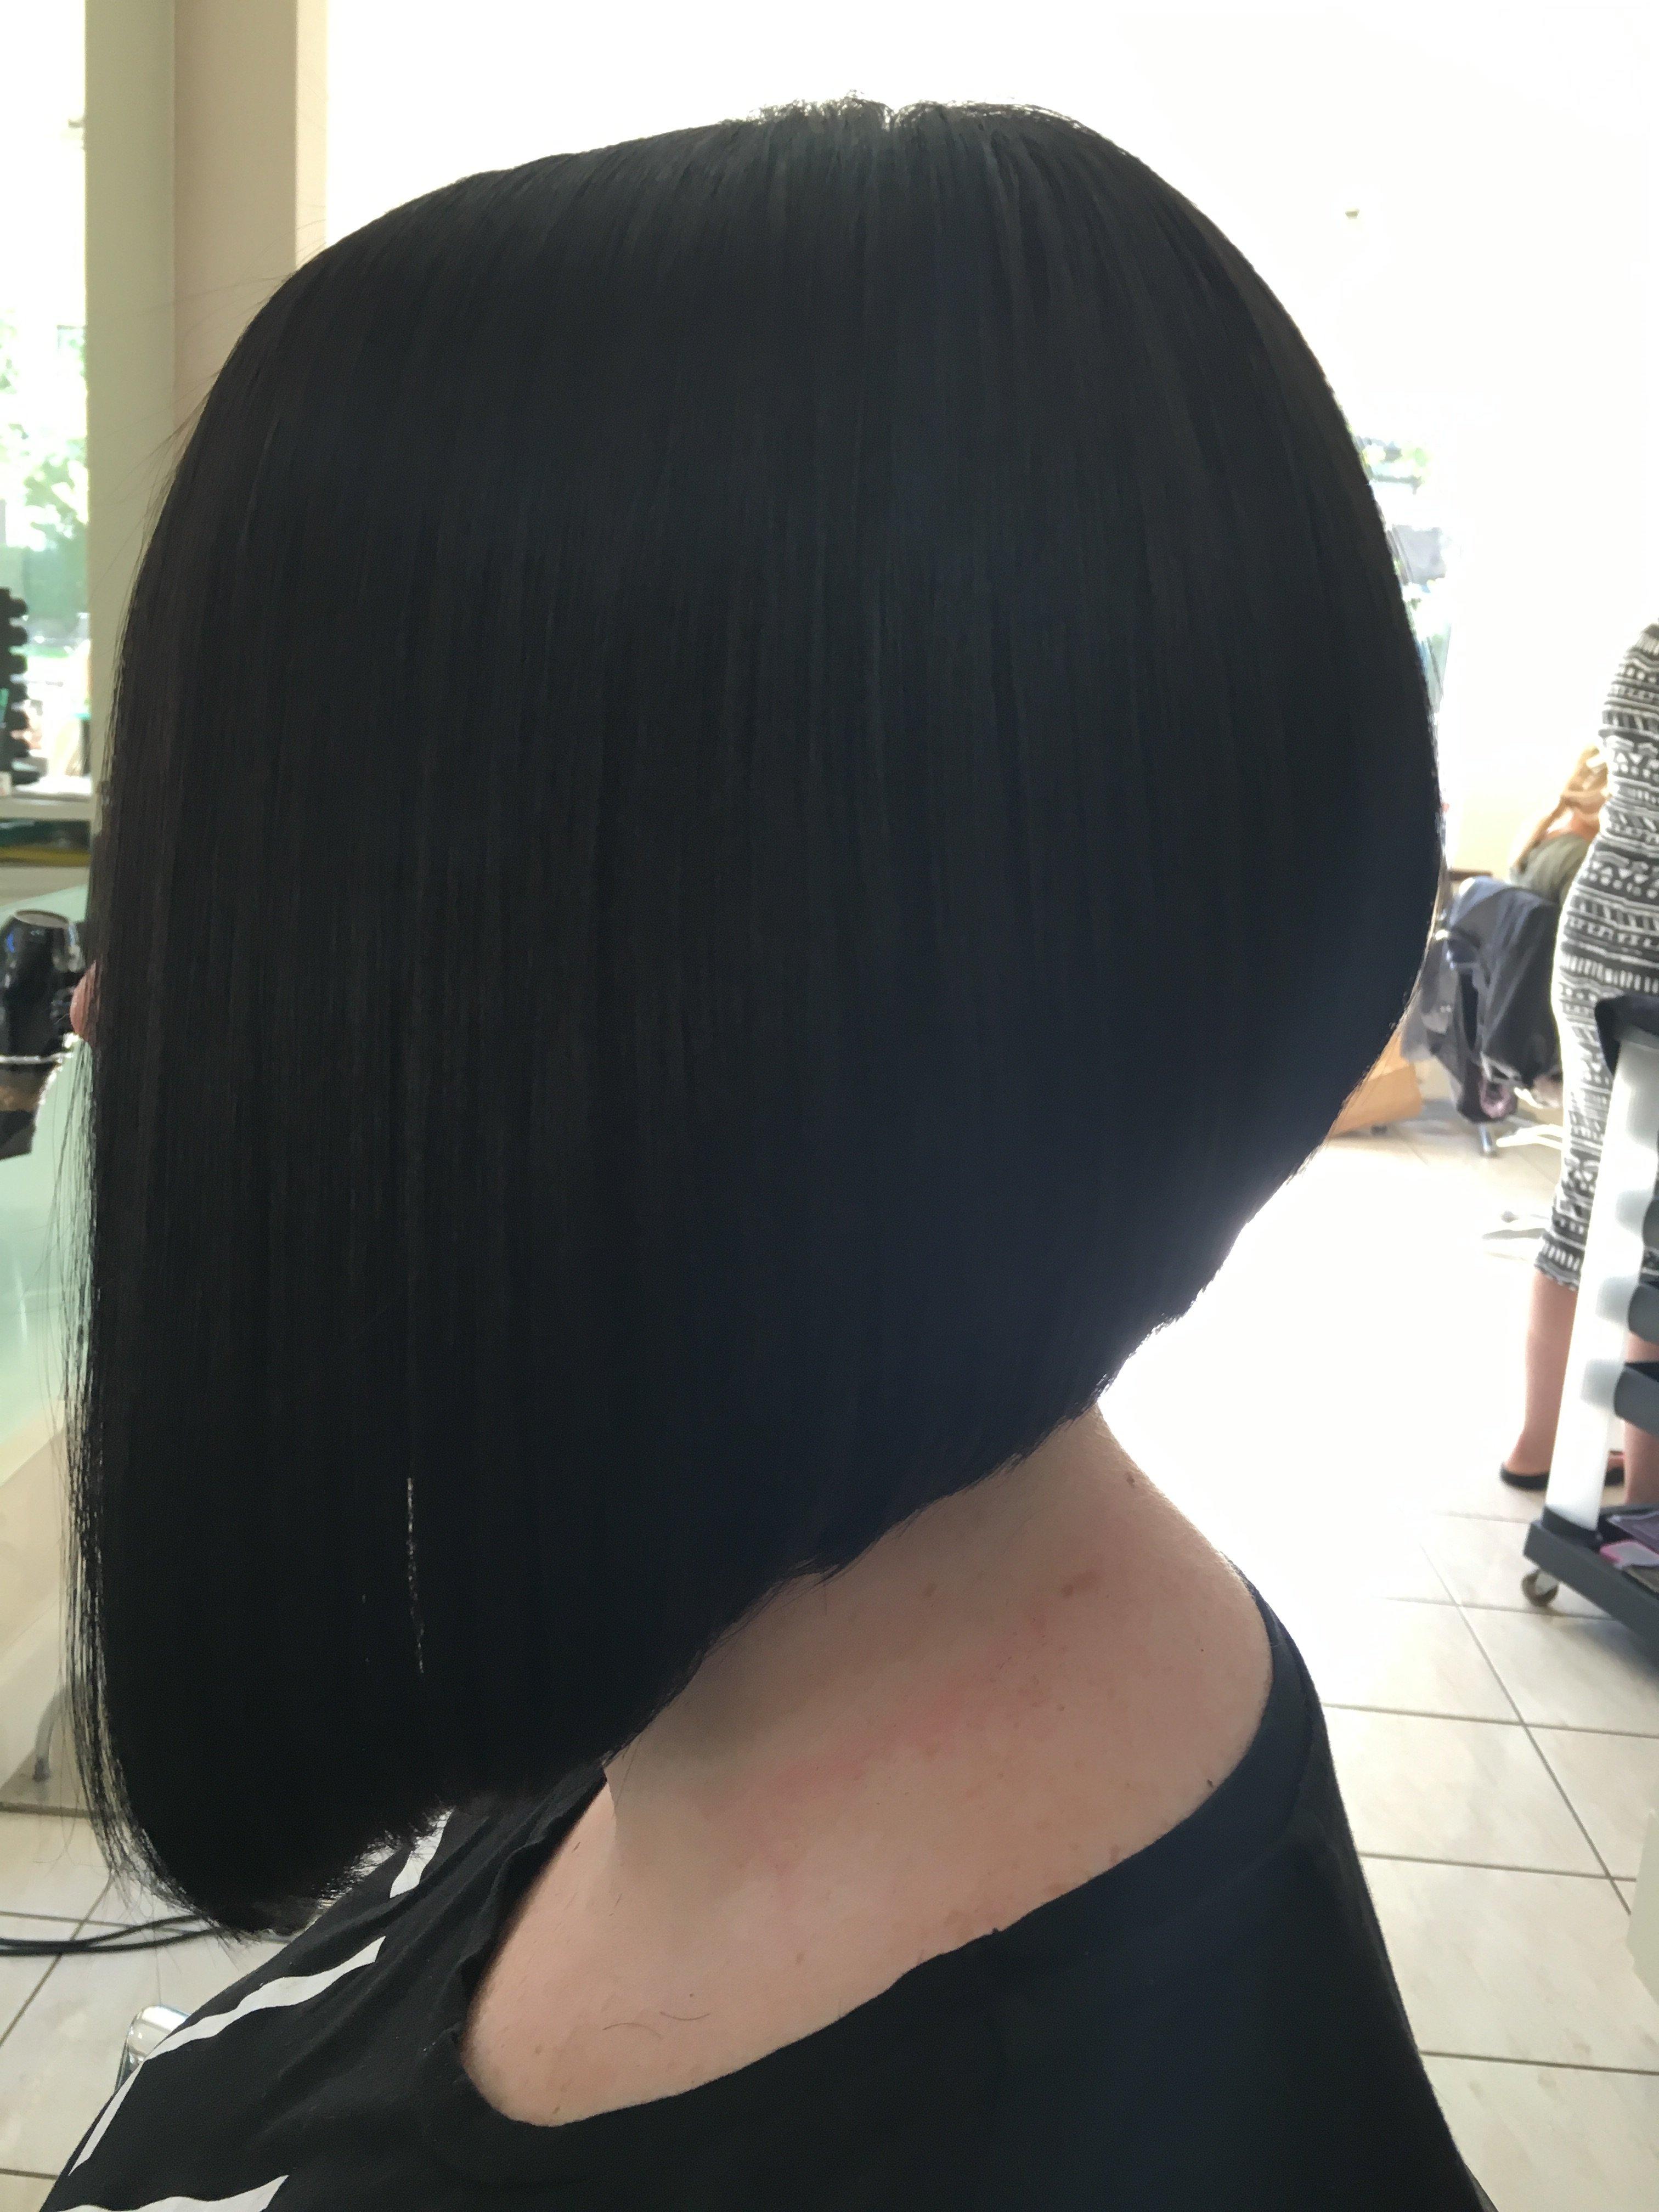 Sleek haircut